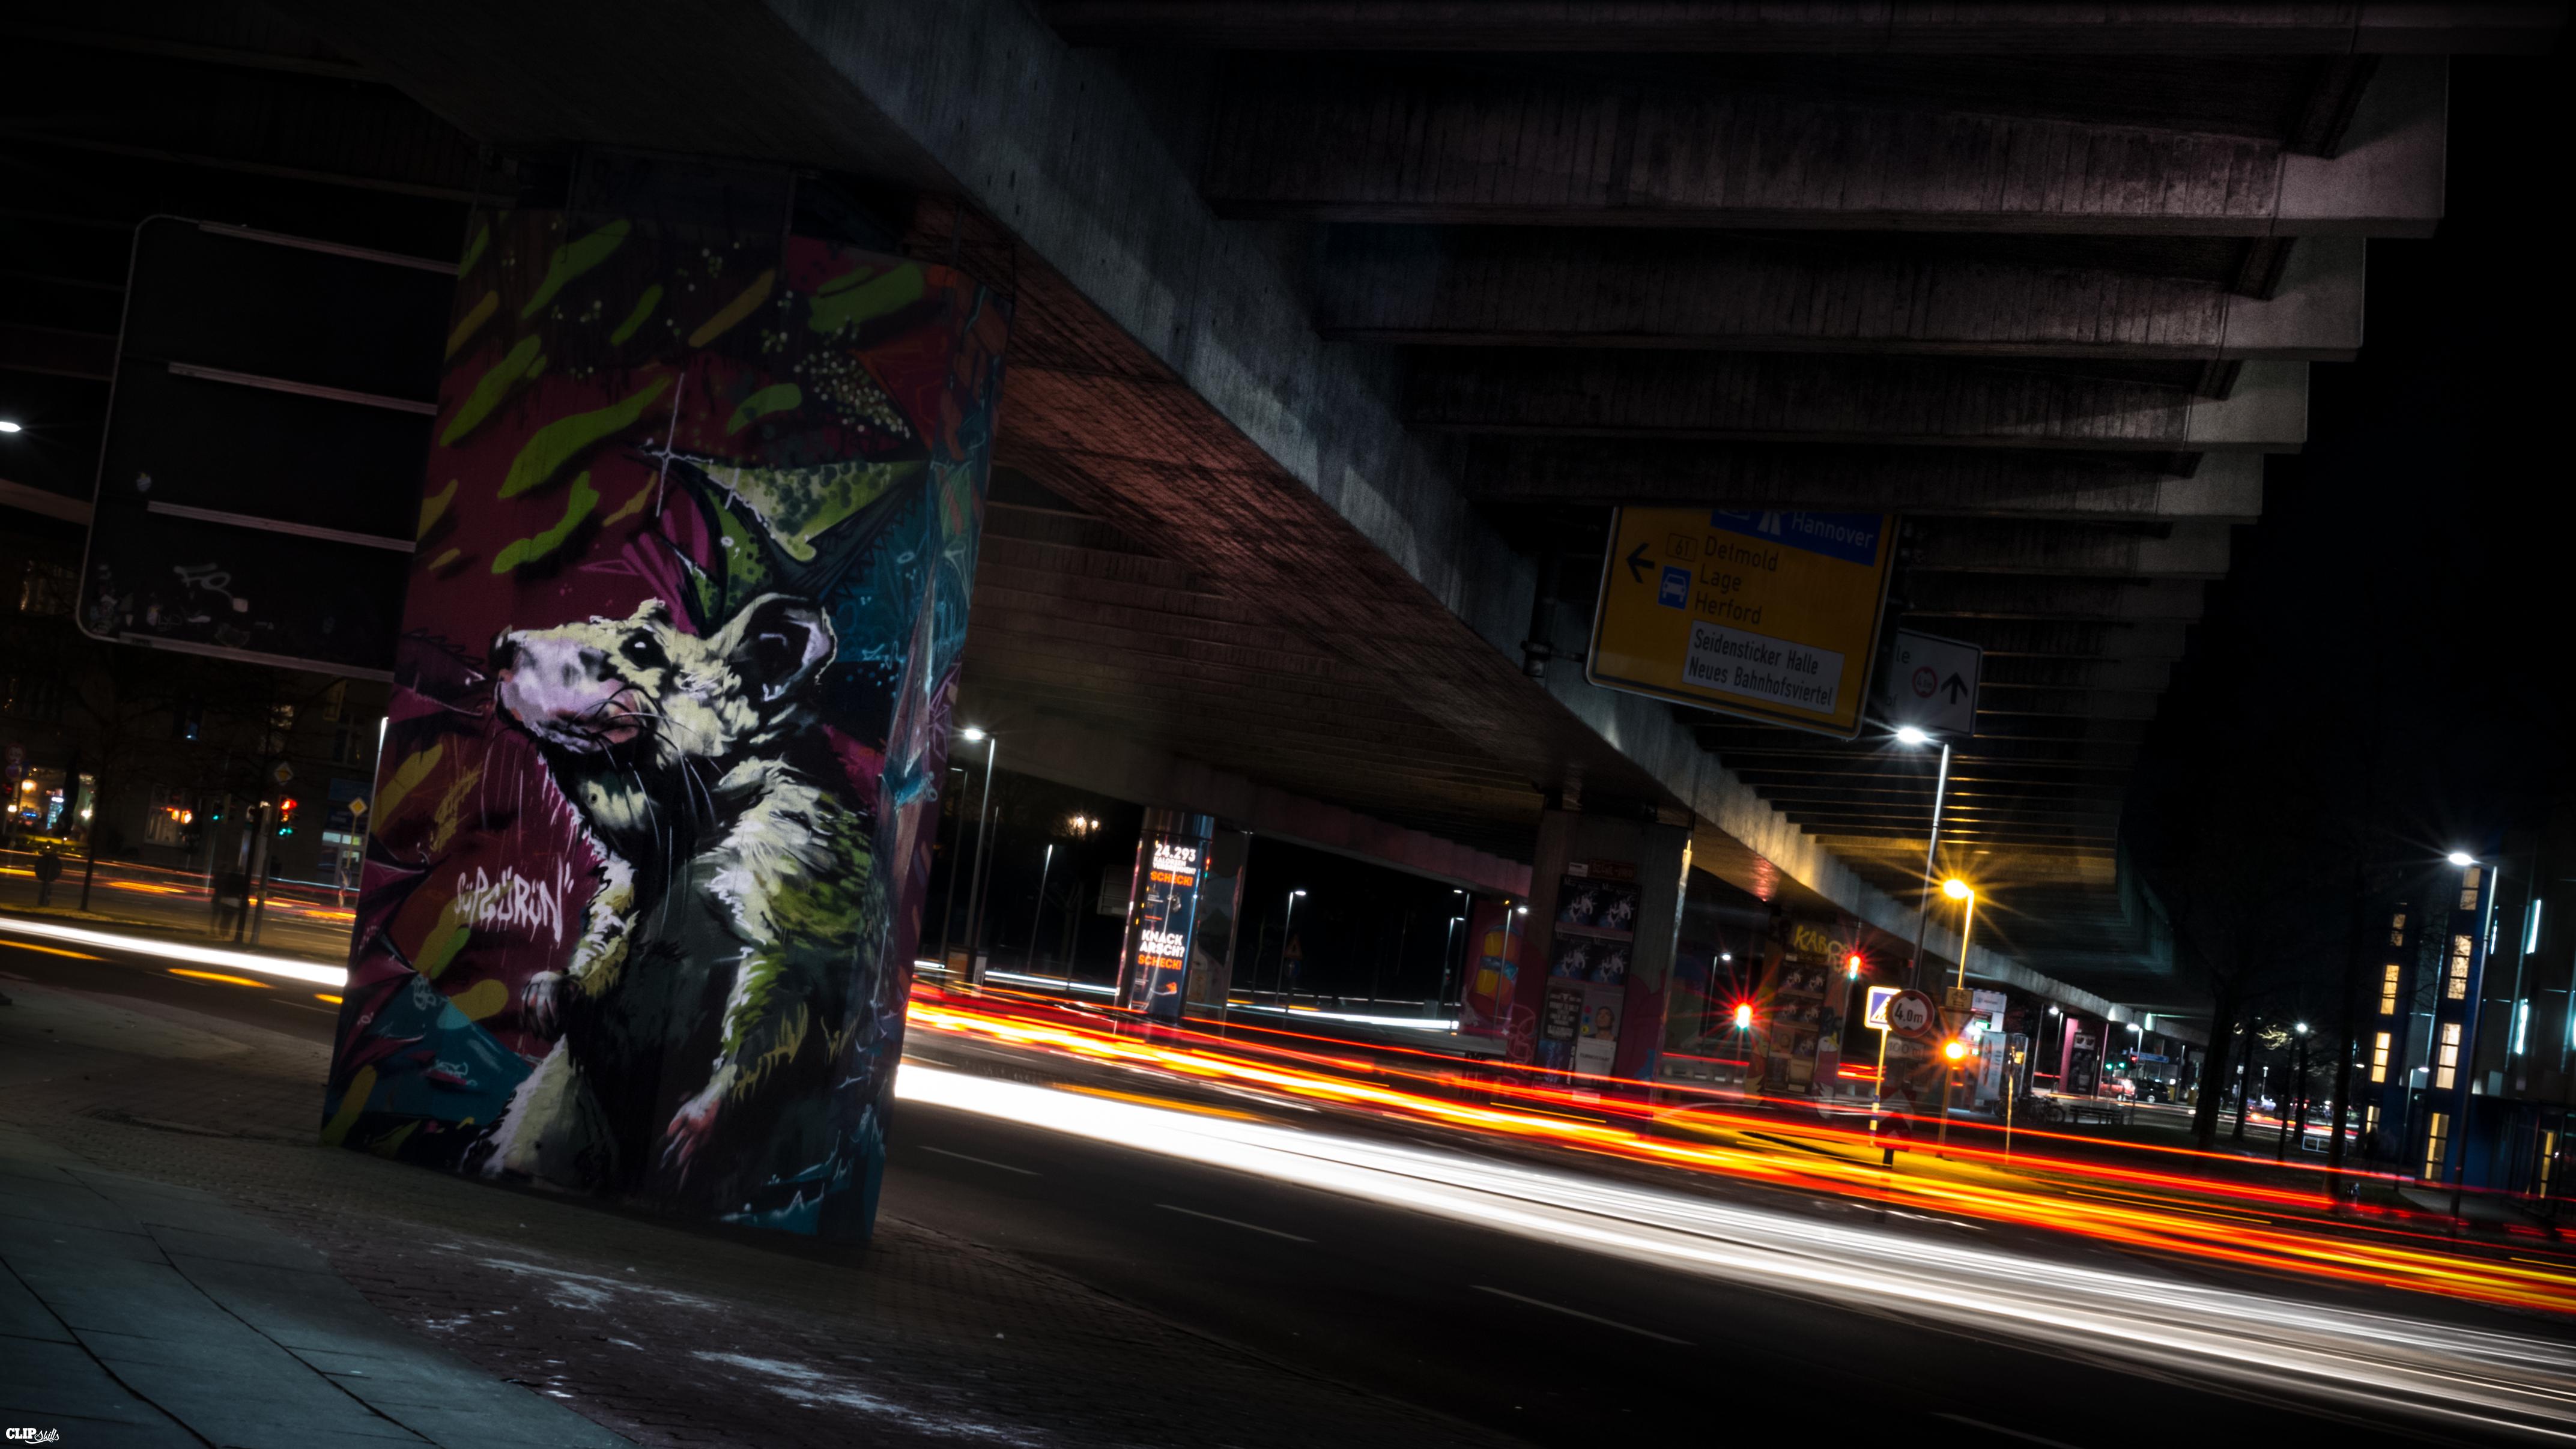 Car Trails below a bridge with graffity 1